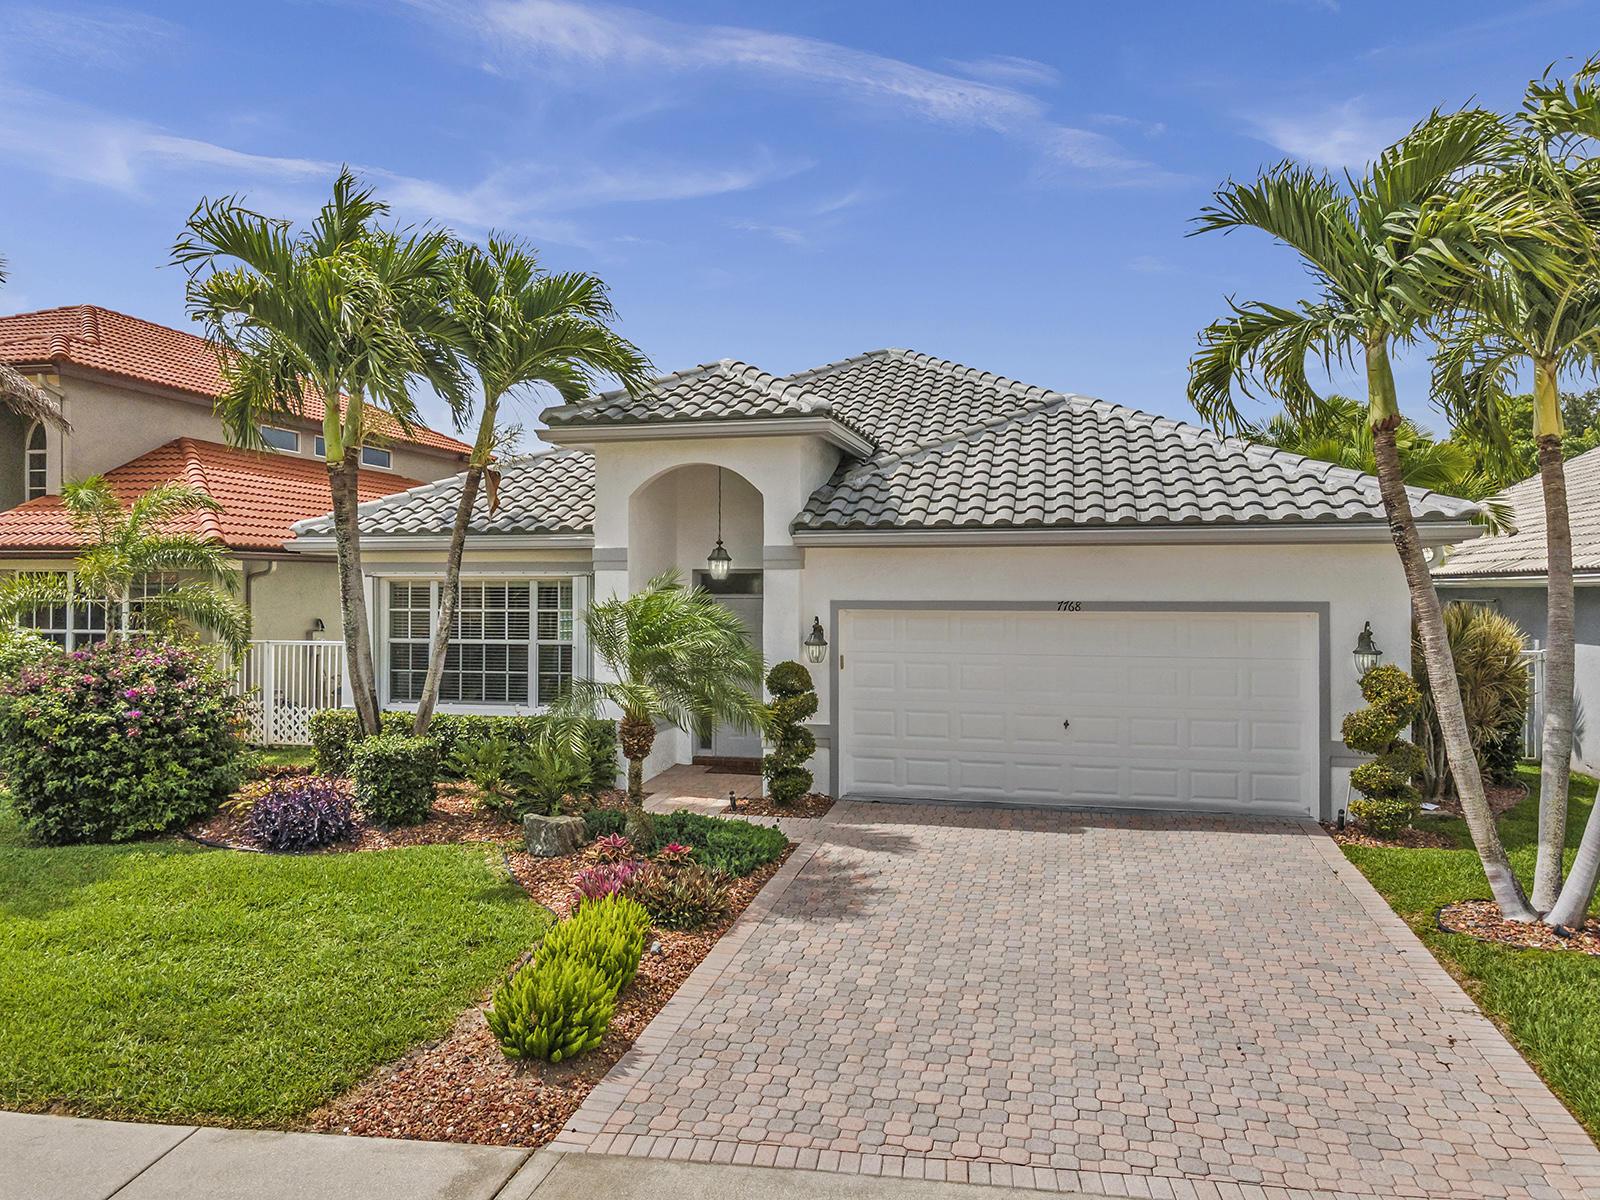 7768  Doubleton Drive  For Sale 10719467, FL